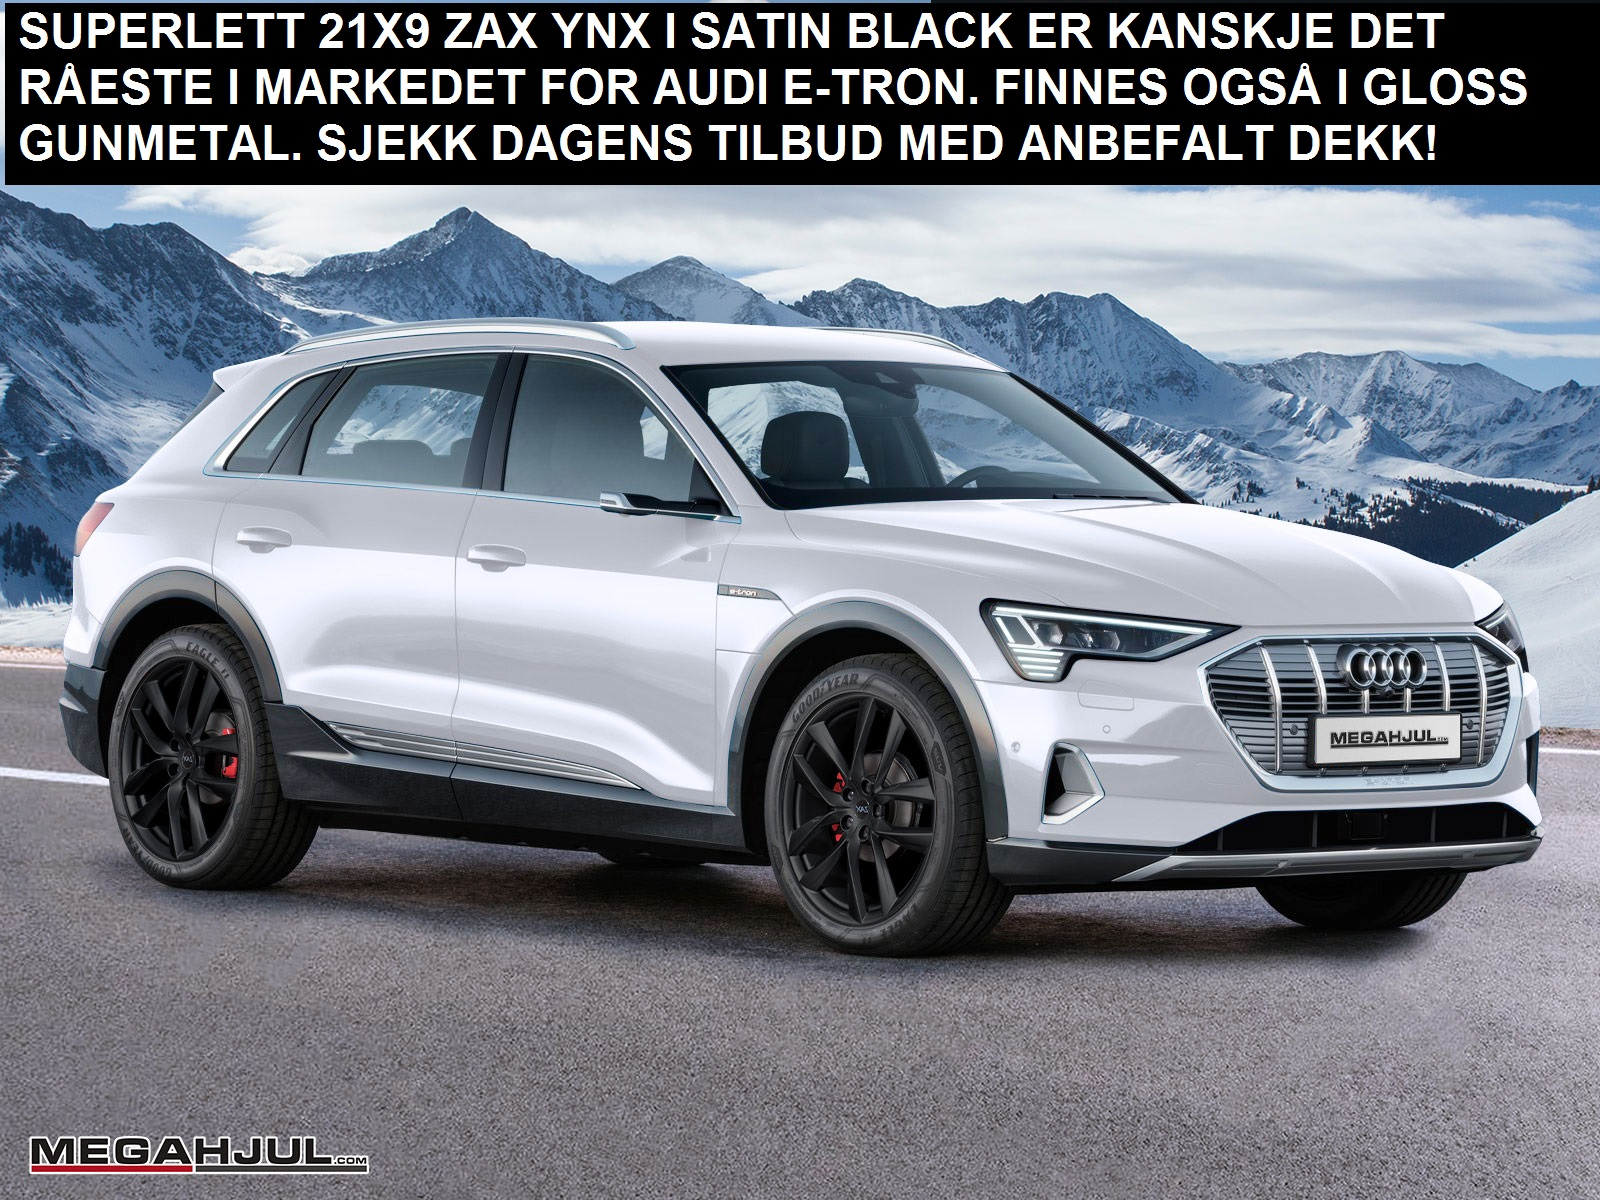 audi-e-tron-felger-dekk-wheels-zax-ynx-satin-black